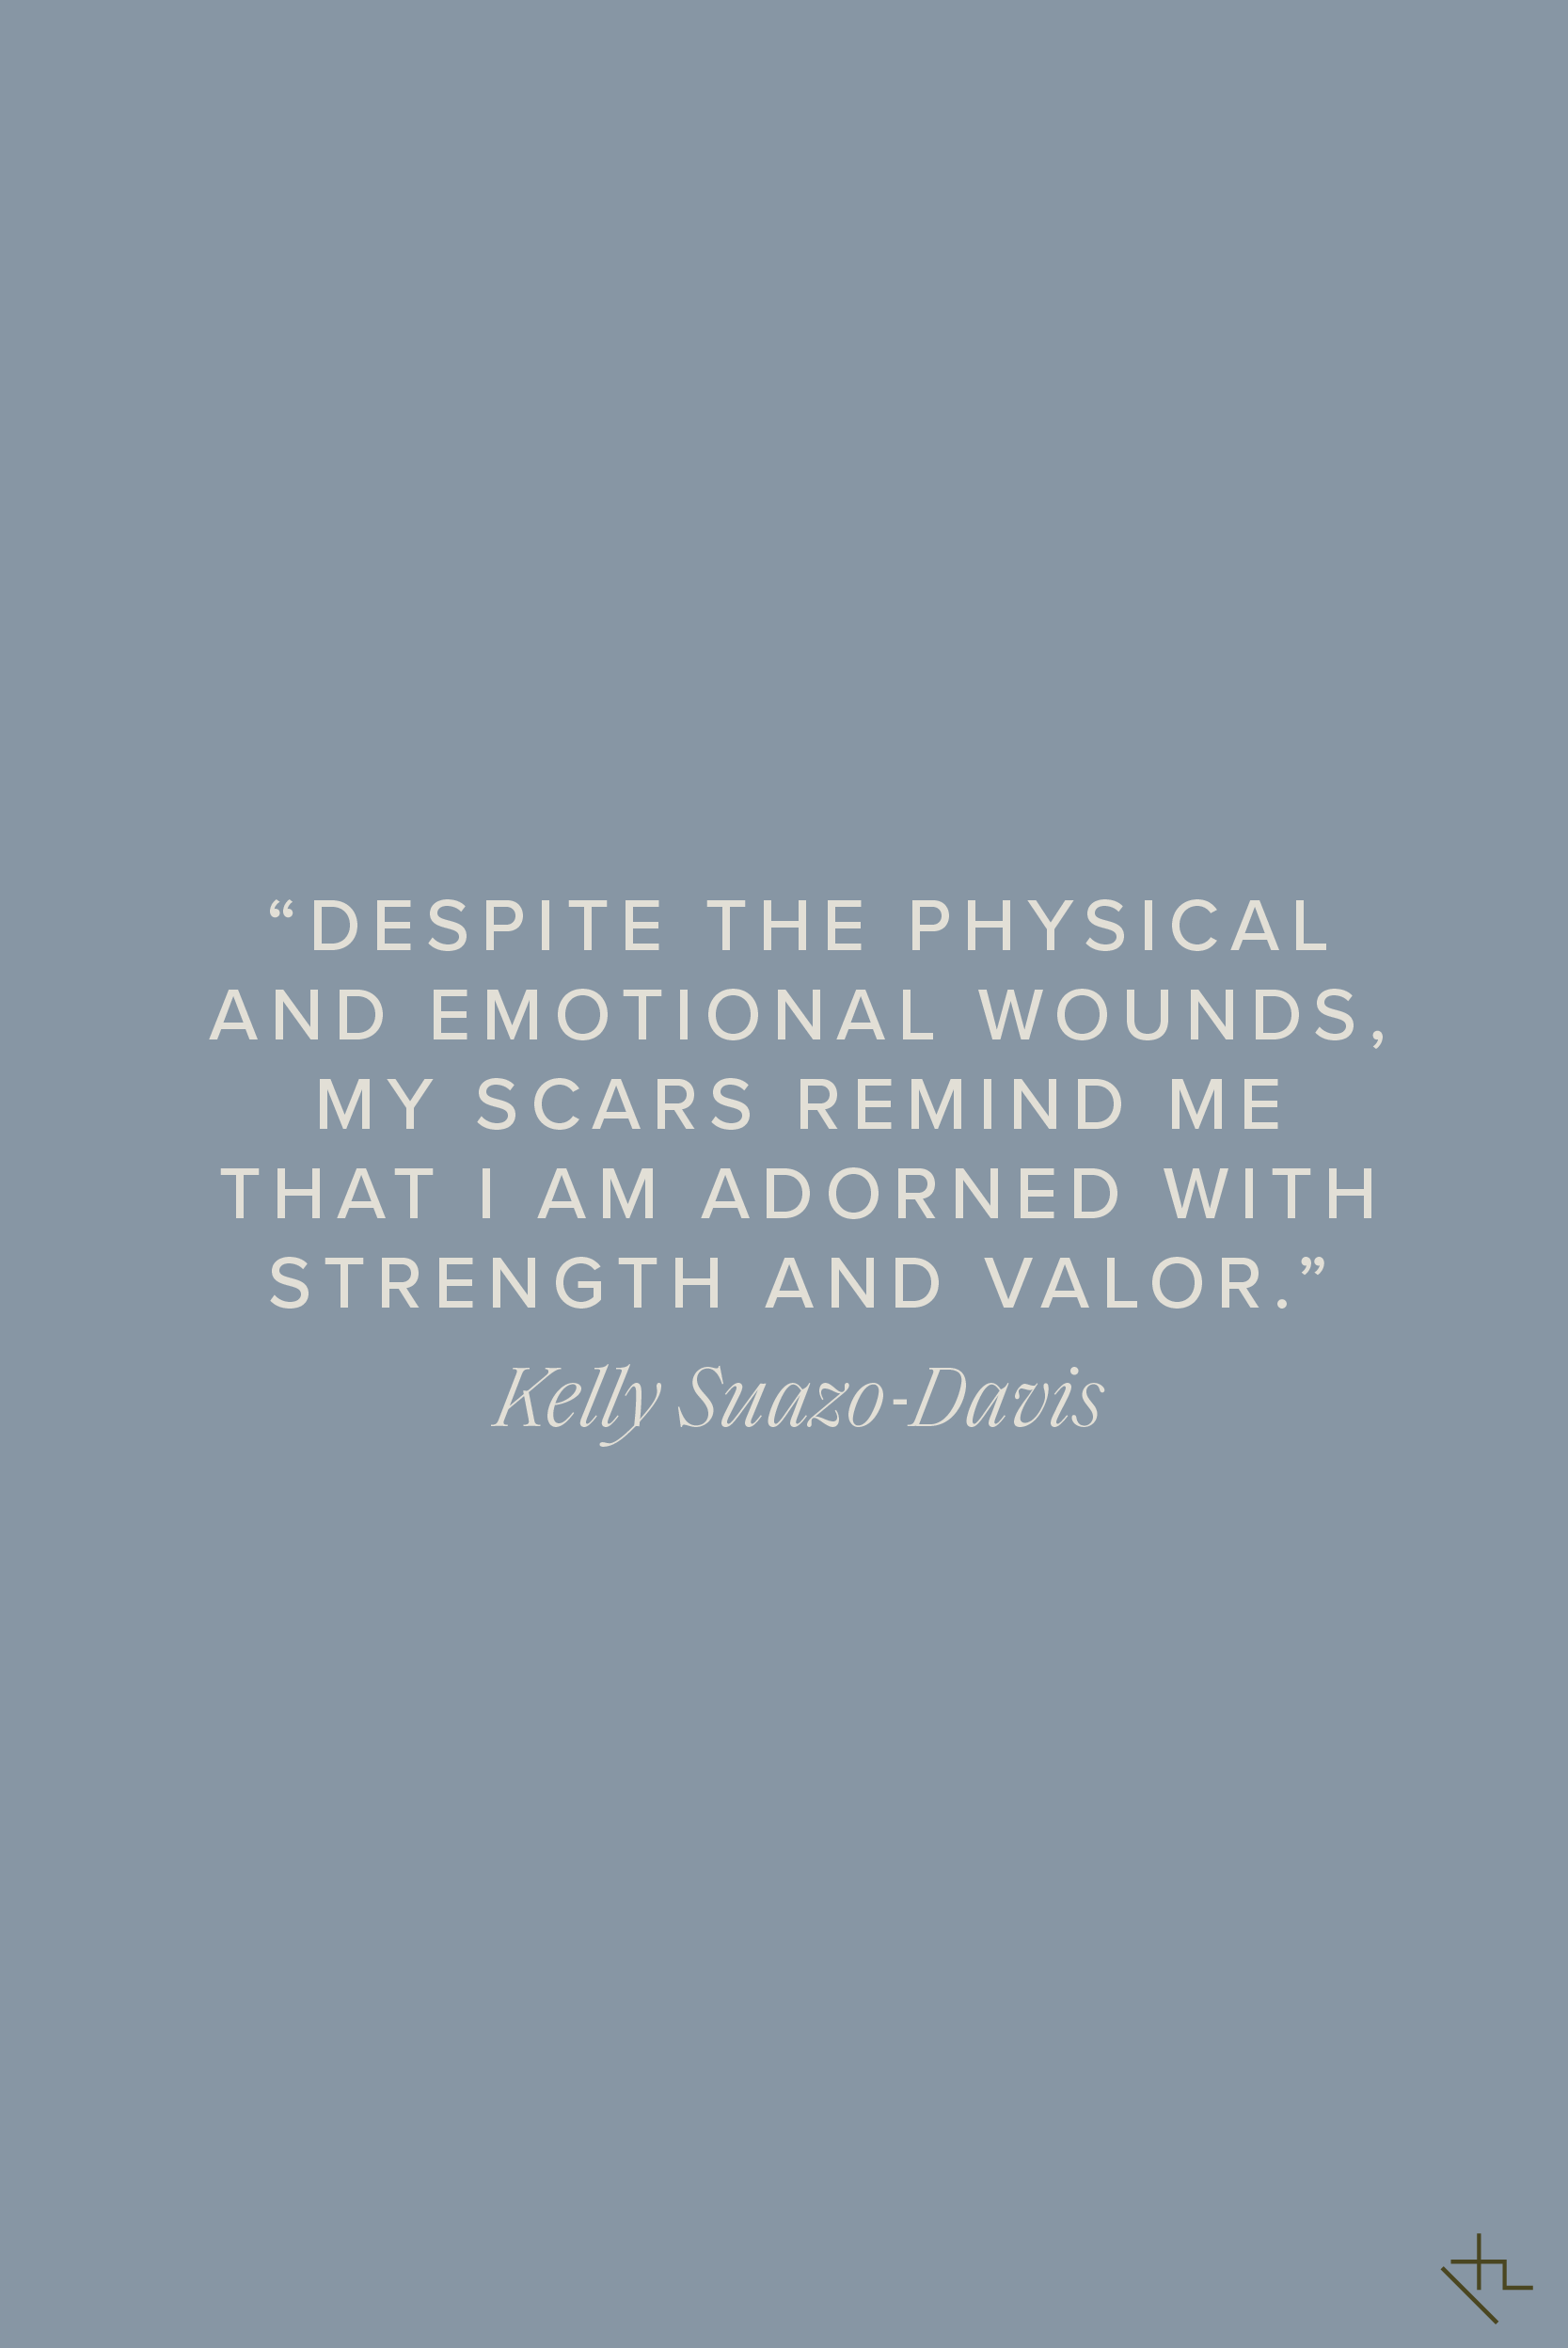 Kelly Suazo-Davis - Pinterest Image